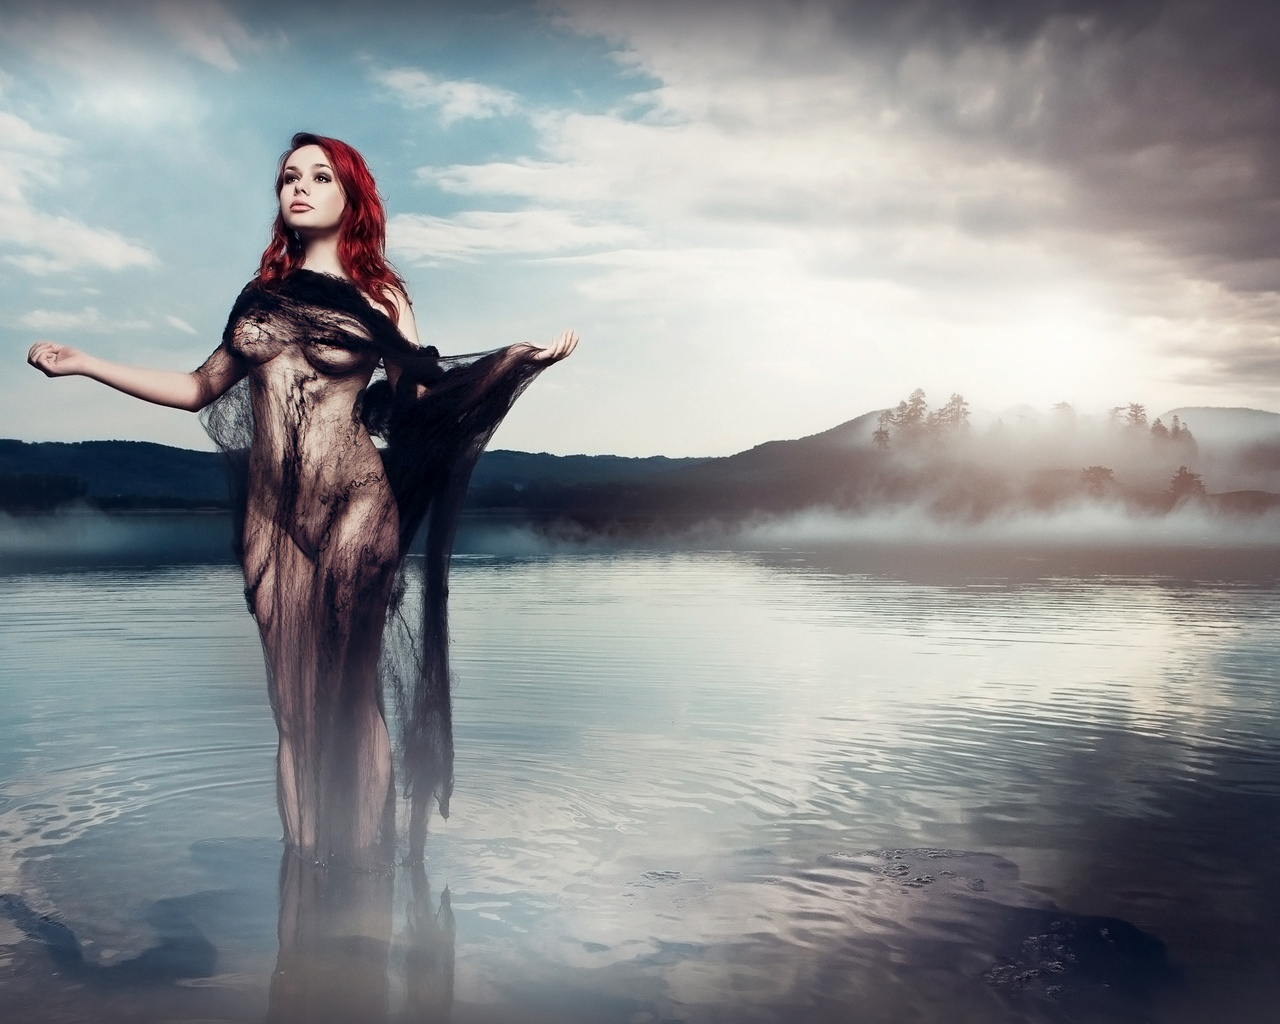 daniel ilinca, model, photo, sexy, tits, nude, закат, вода, небо, прозрачно, вуаль, шатенка, грудь, живот, сиськи, взгляд, облака, cs6, kraft